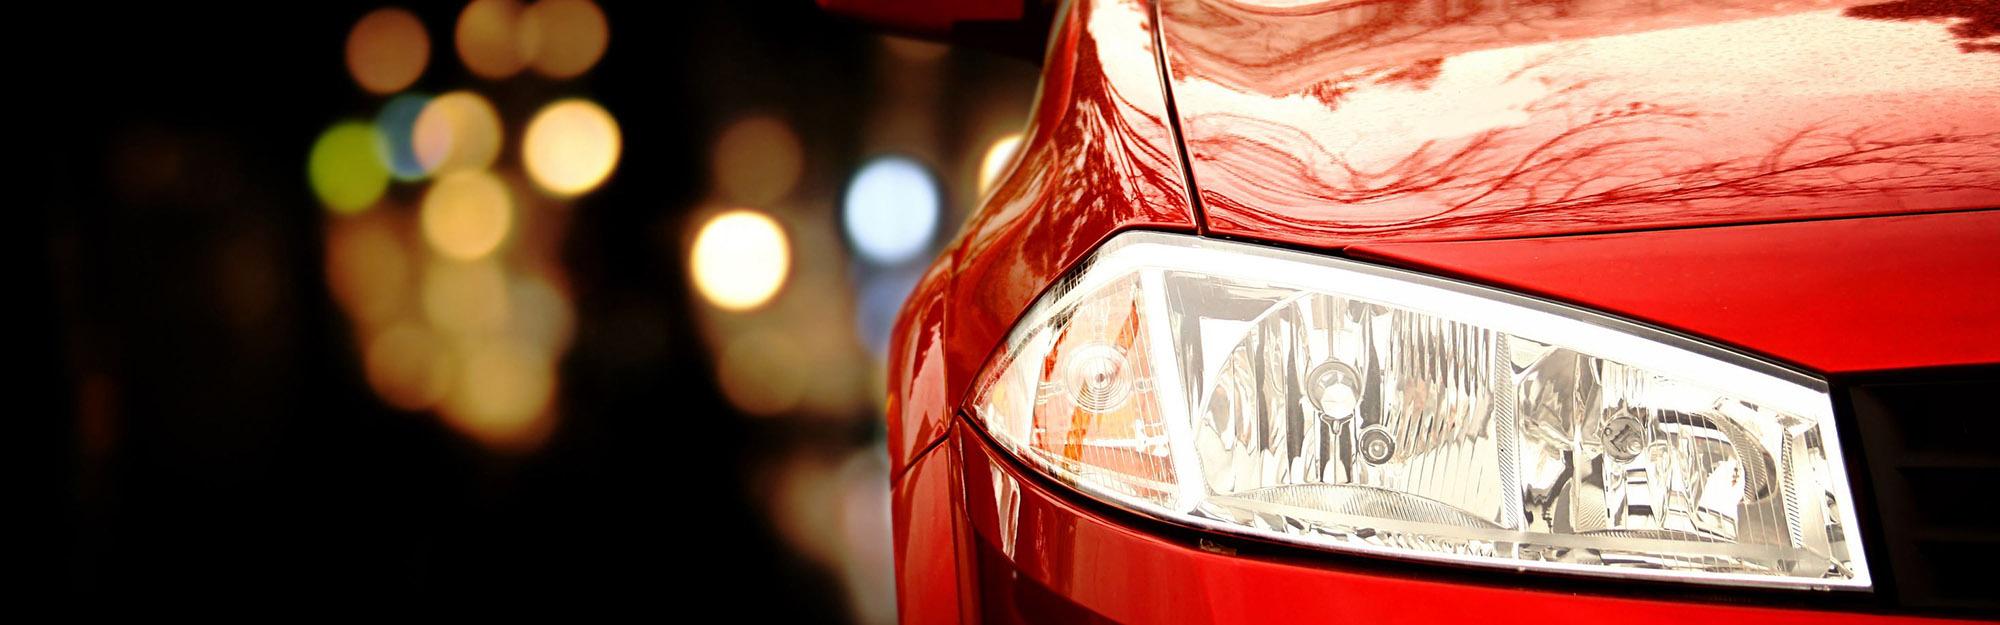 Red Mustang Headlight